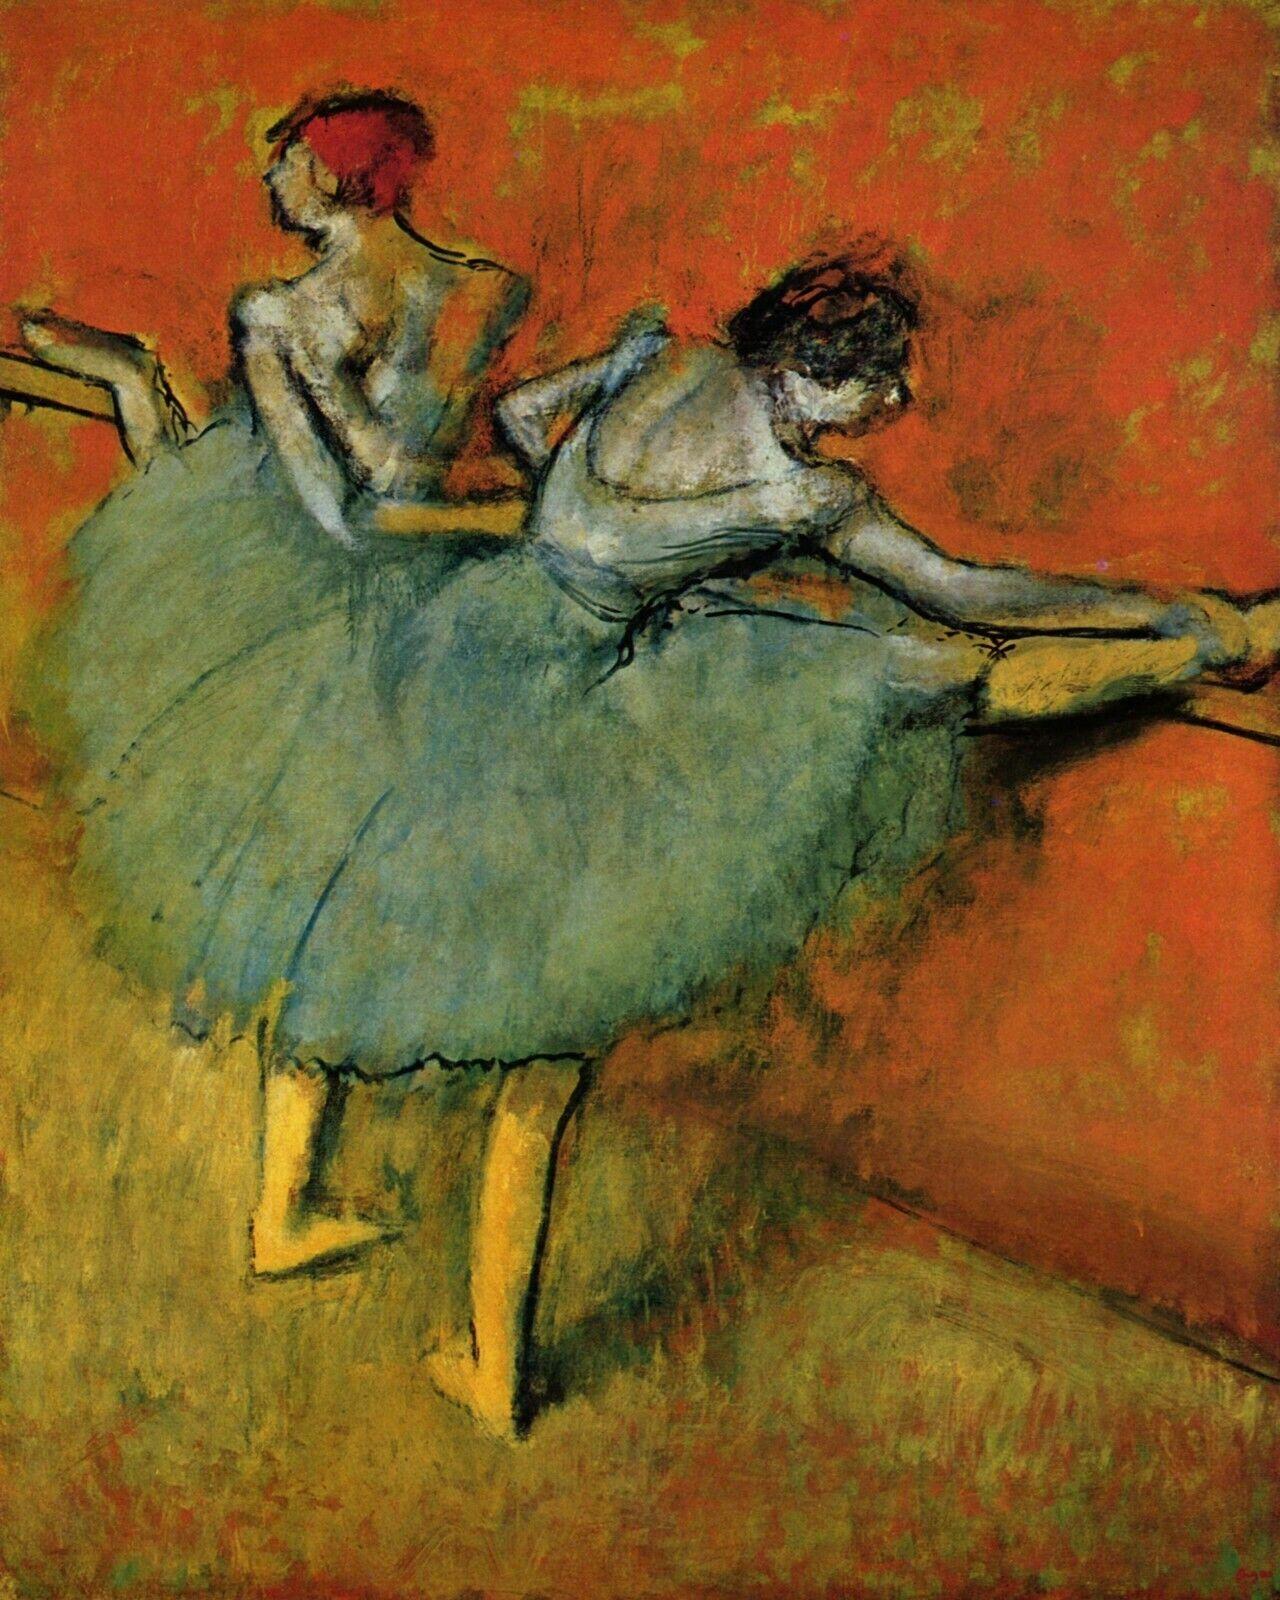 Four dancers by Edgar Degas 66 Van-Go Paint-By-Number Kit